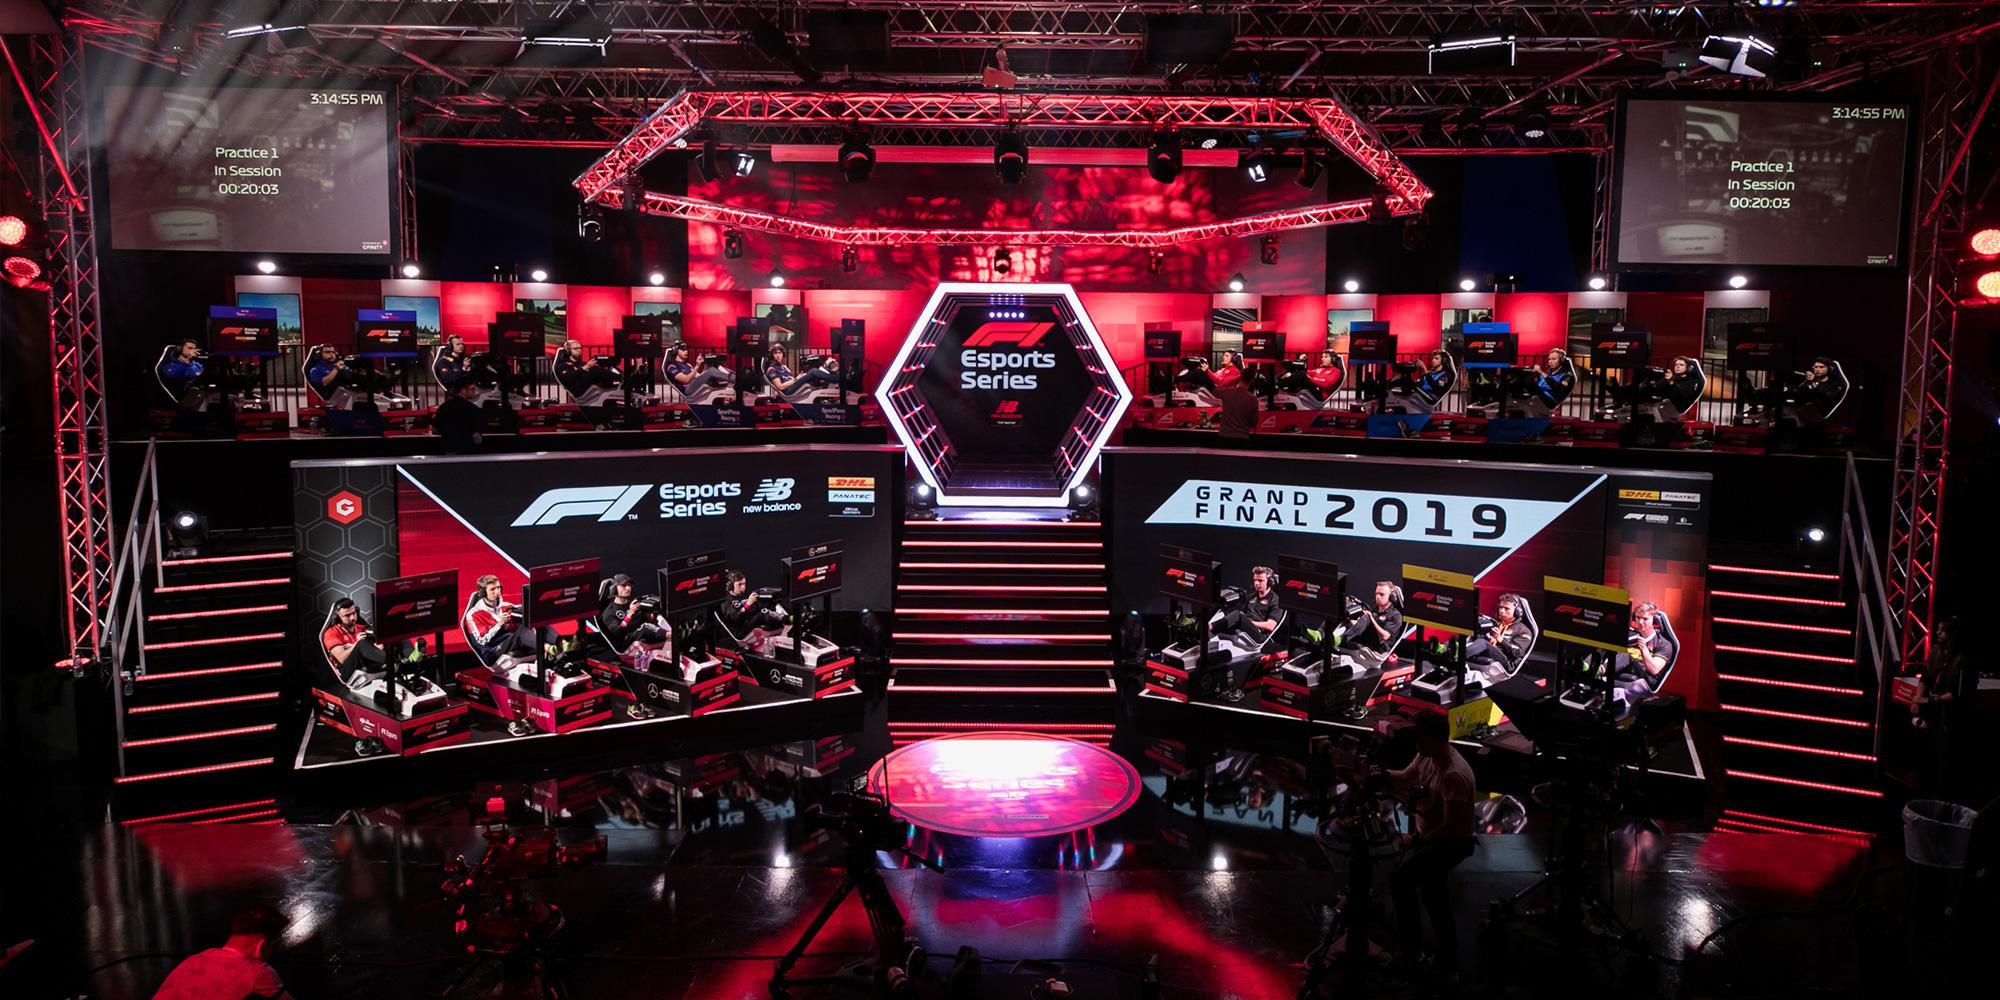 2019 F1 Esports Grand Final – Gallery 2